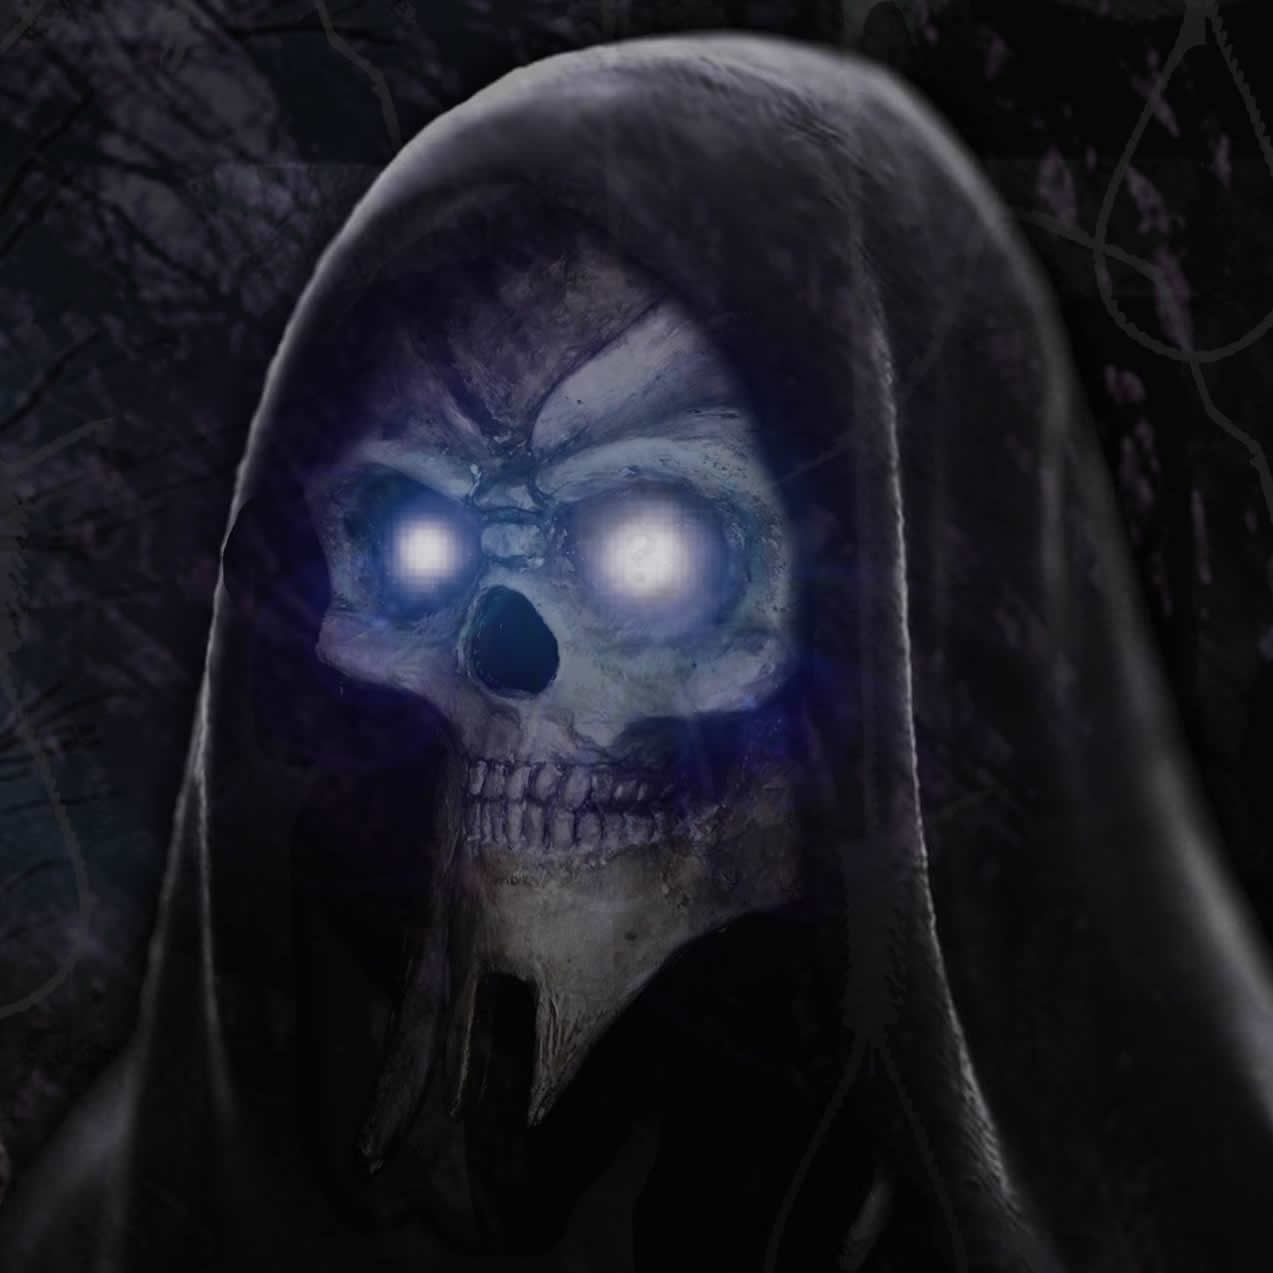 Reaper Merch